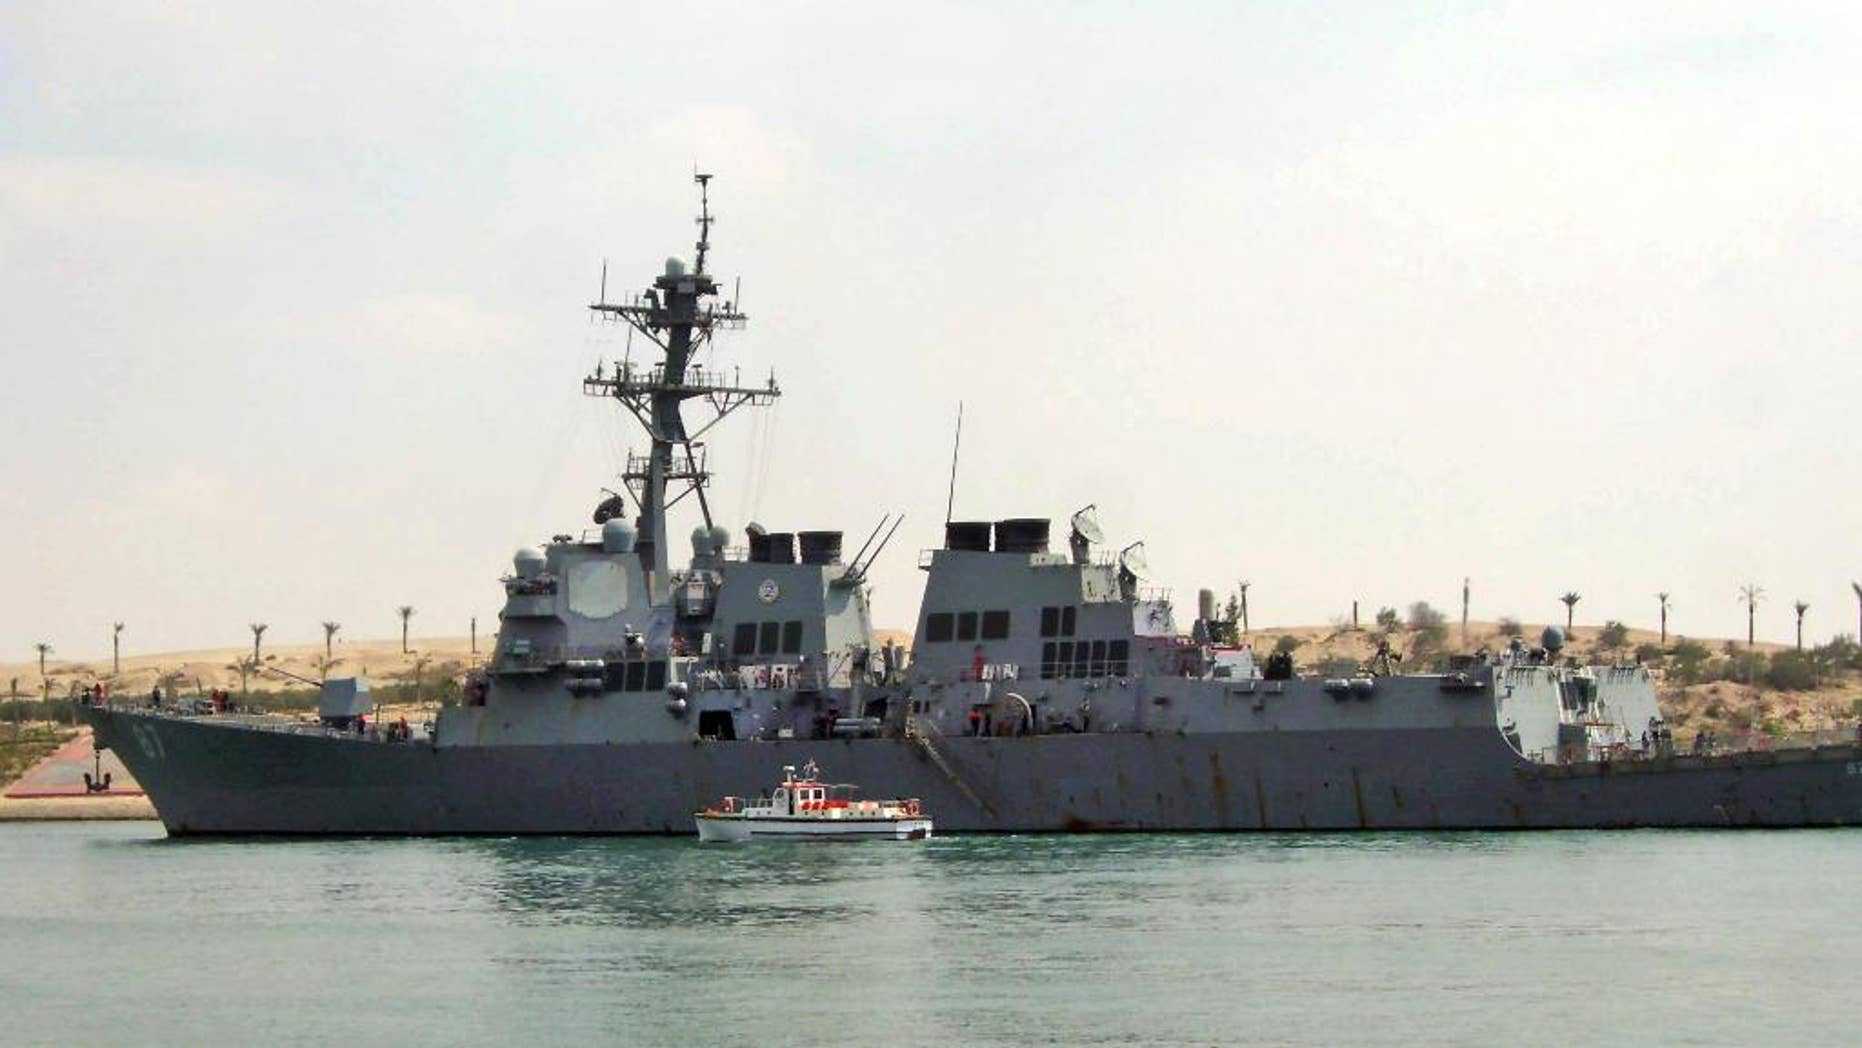 The USS Mason in 2011.